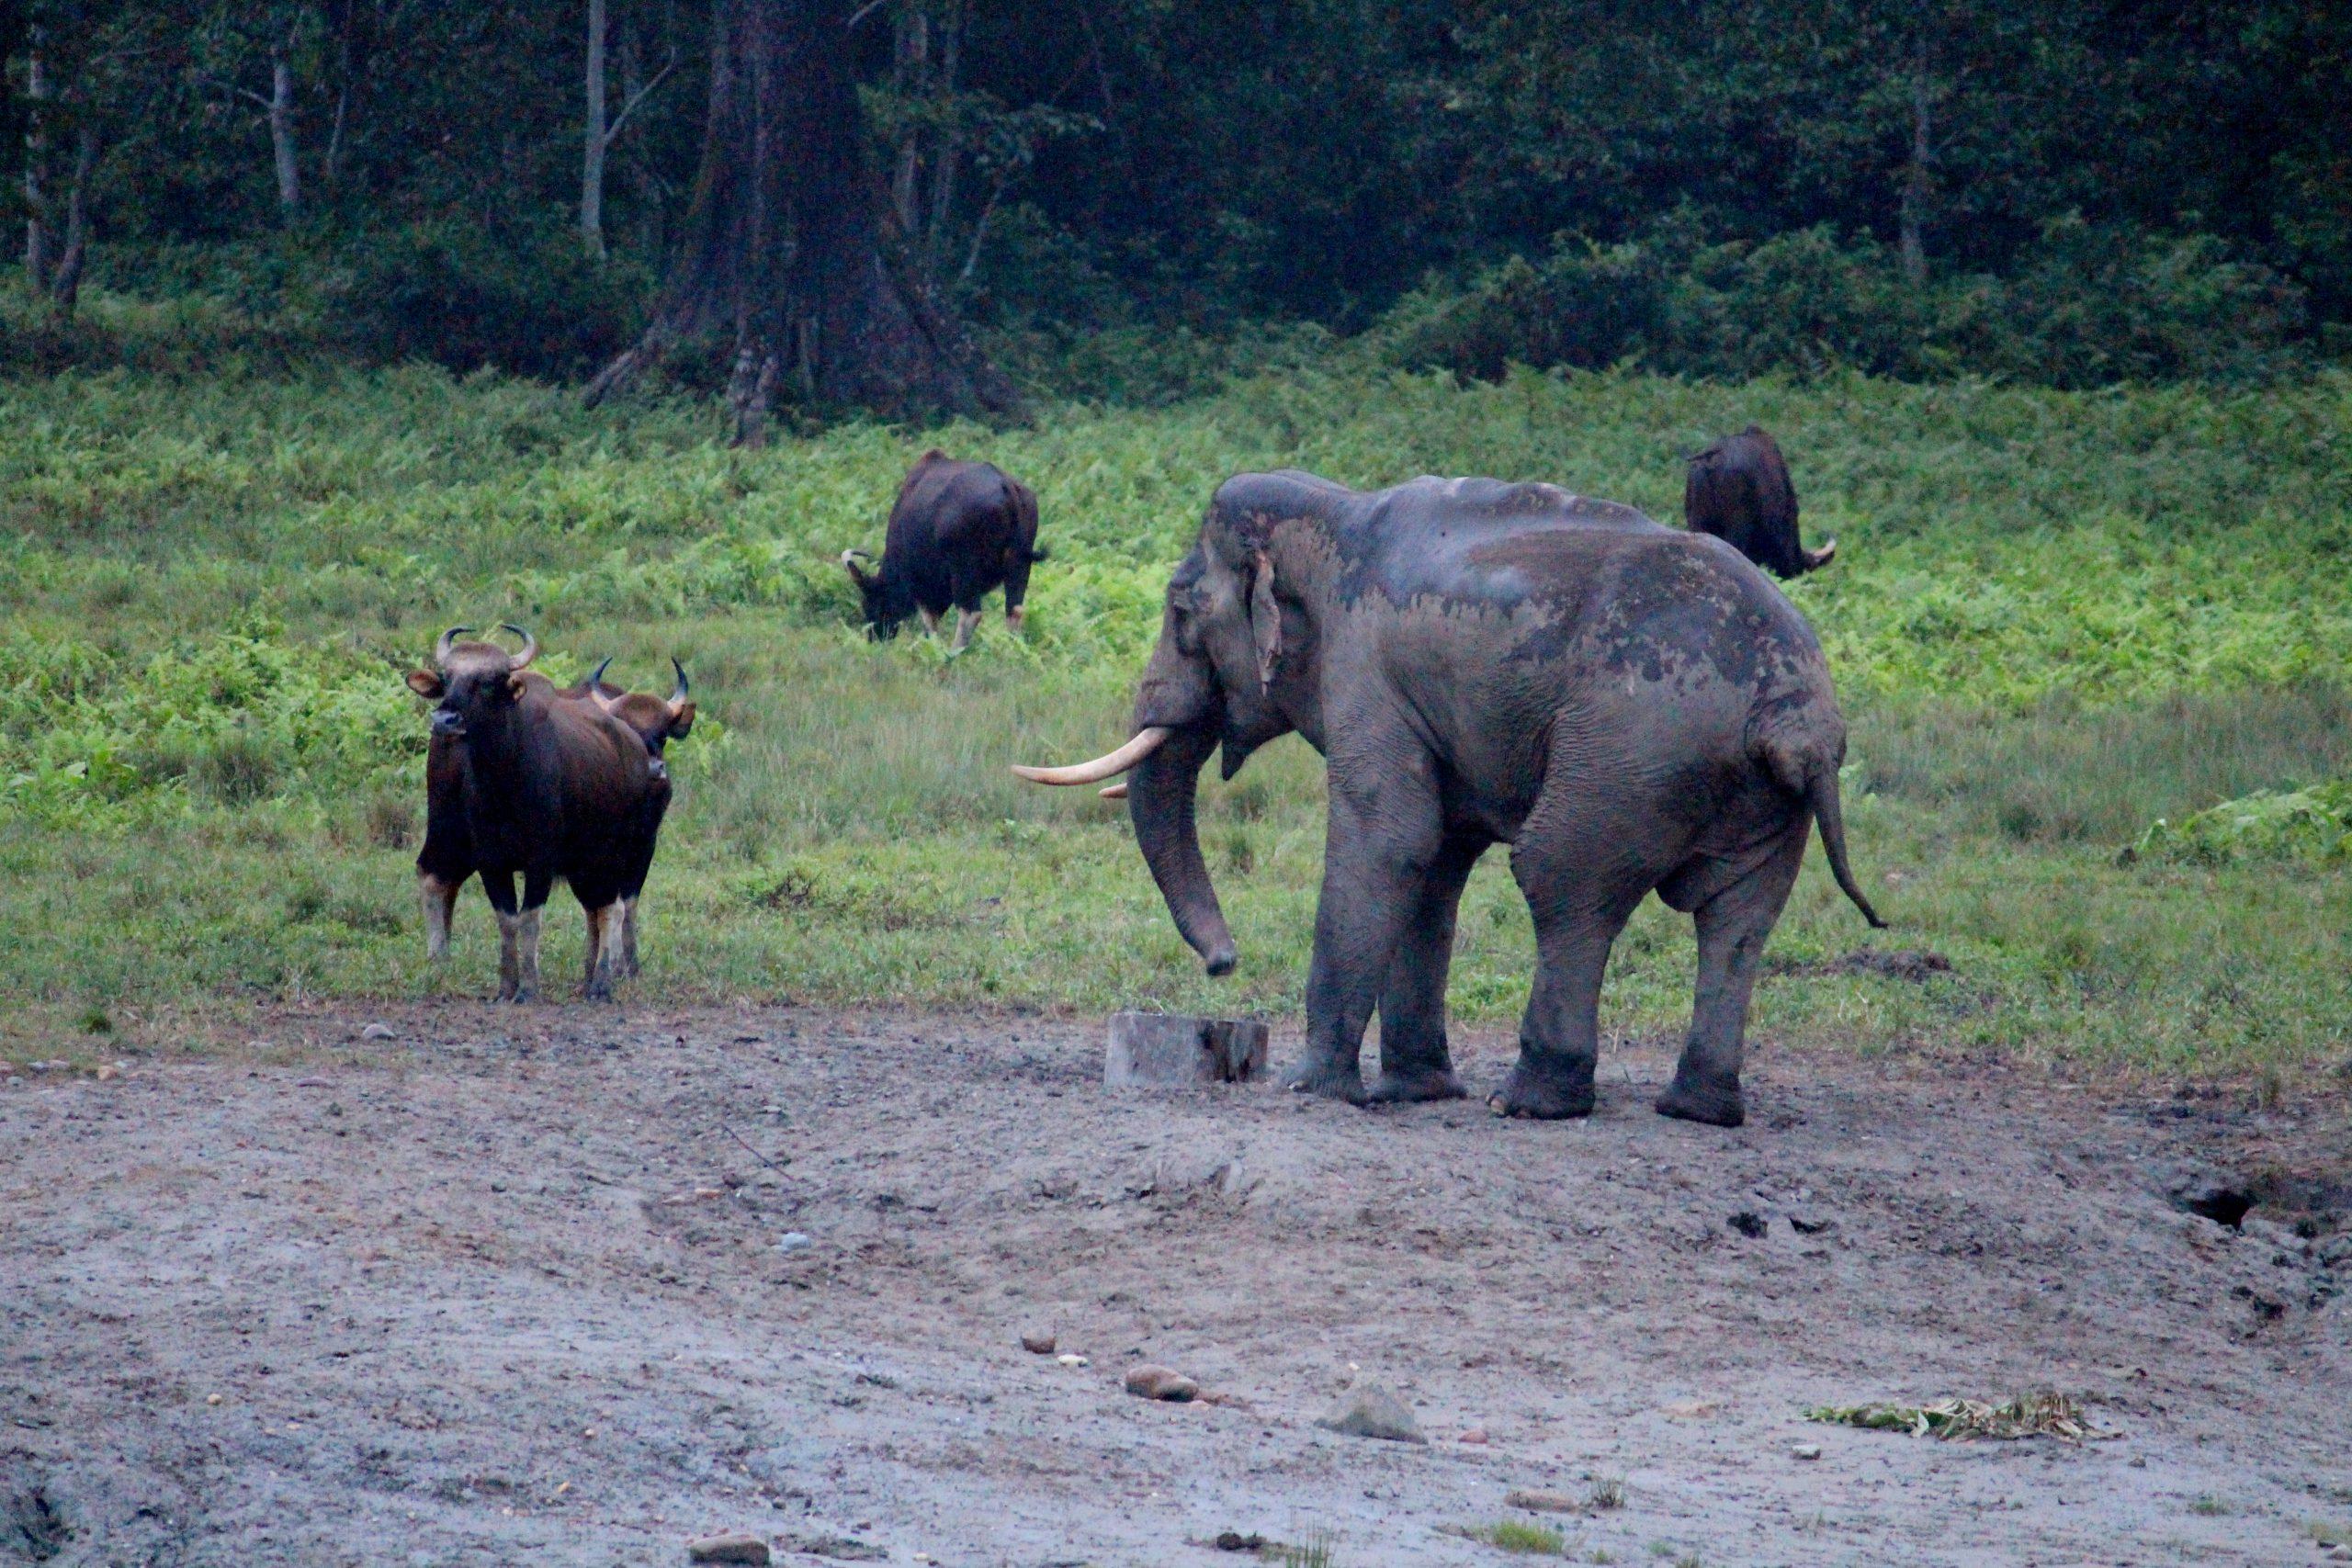 Spotting One-Horned Rhinos in Jaldapara Wildlife Sanctuary elephants